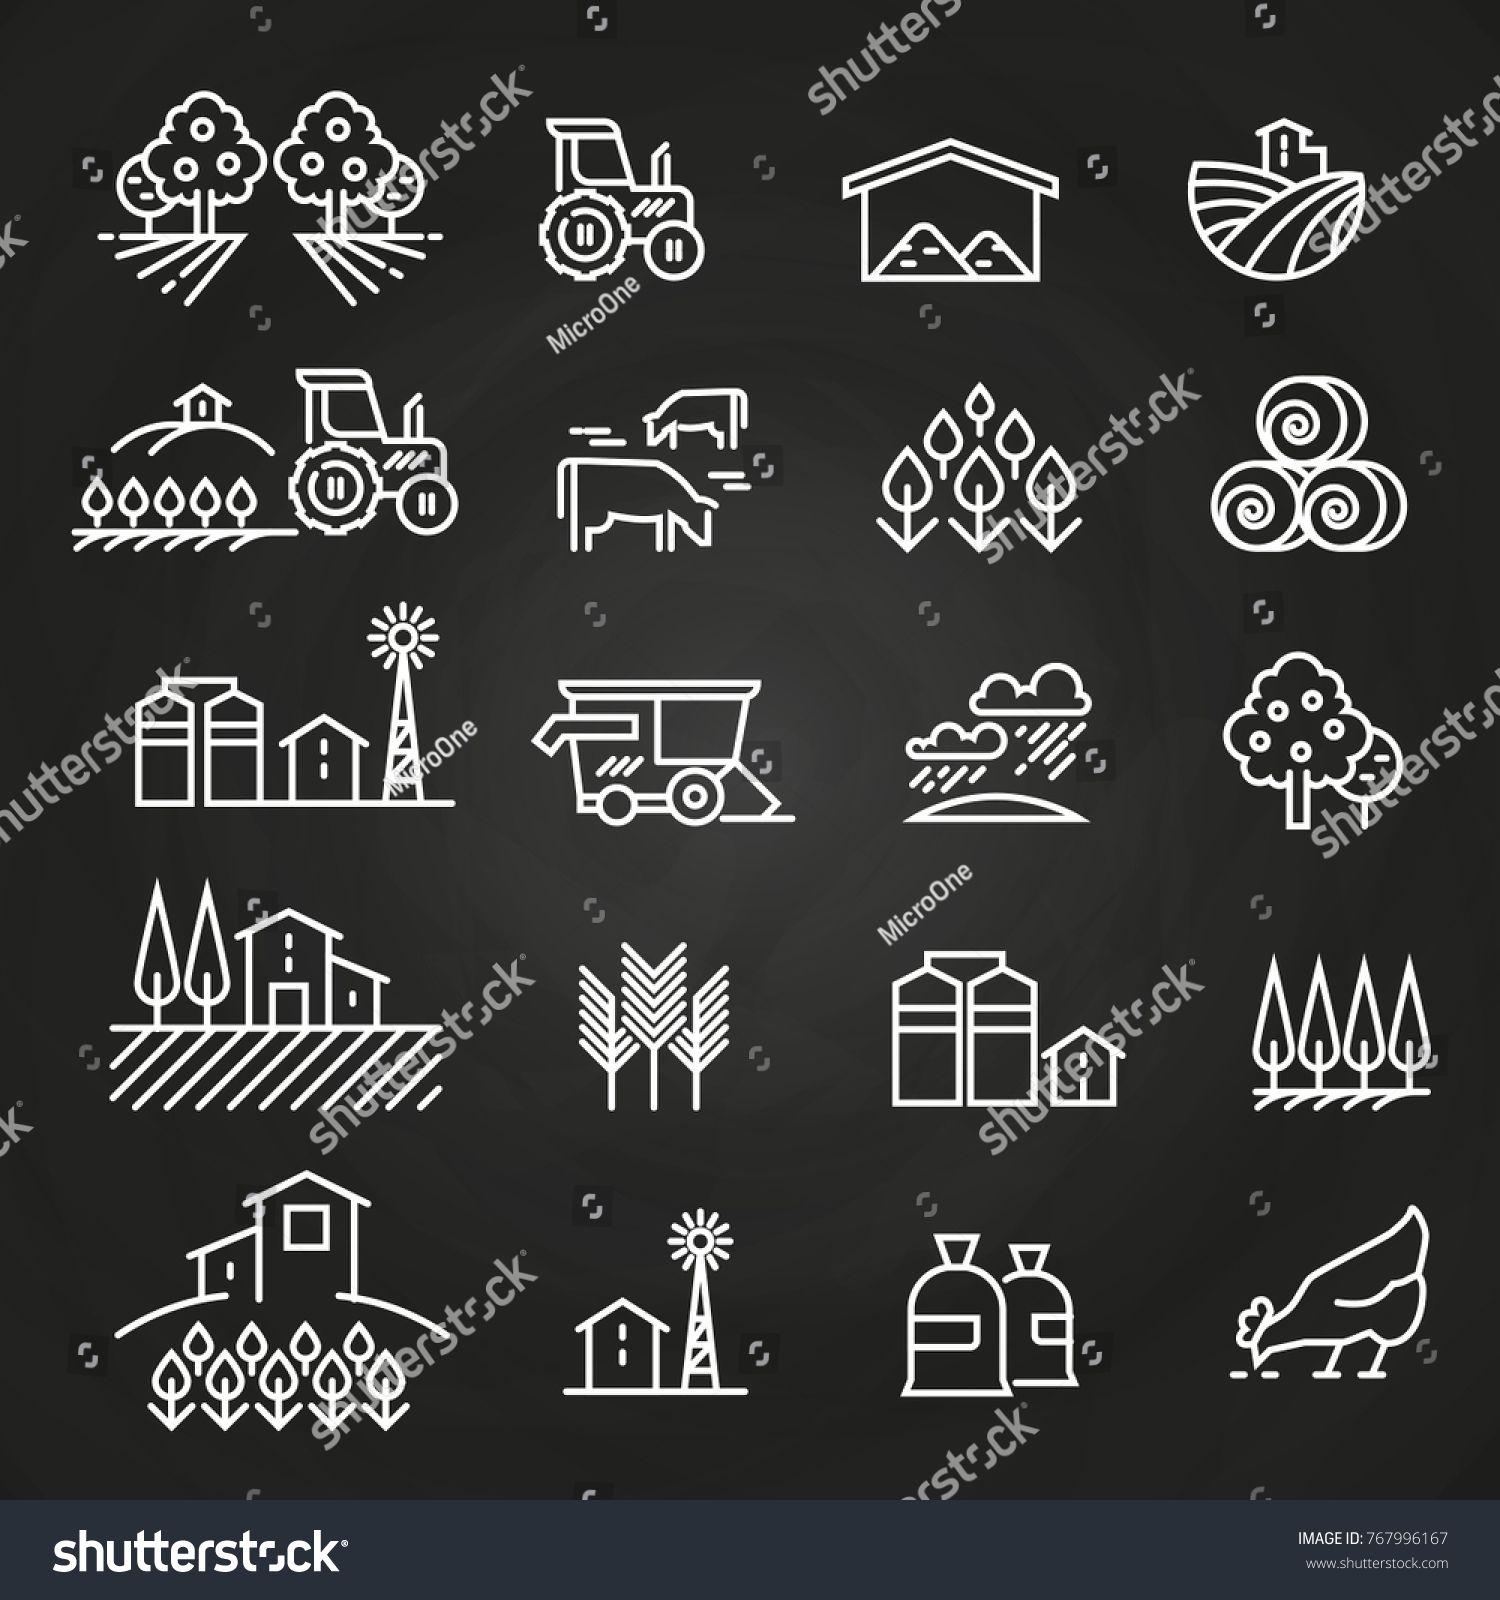 White farm icons and concepts on blackboard. Farm